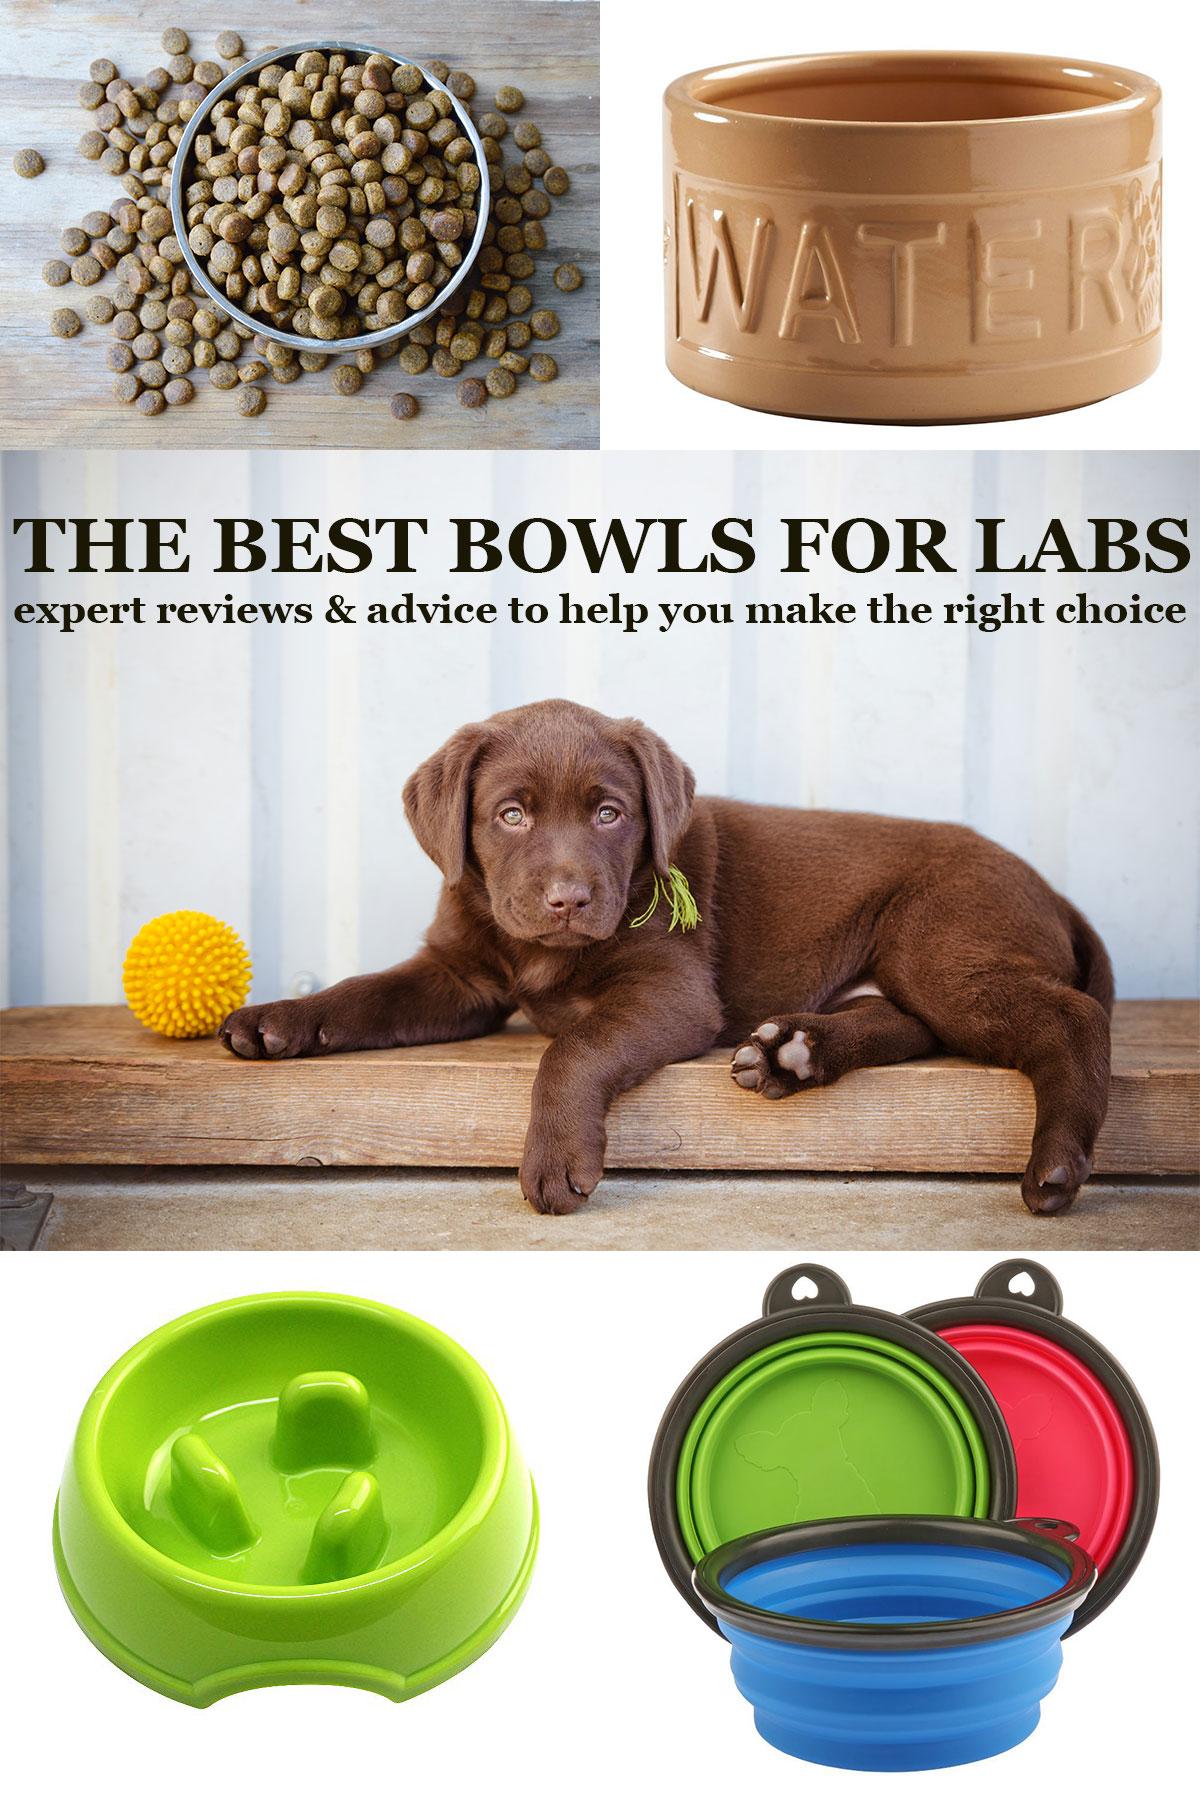 bestbowl - Dog Bowls